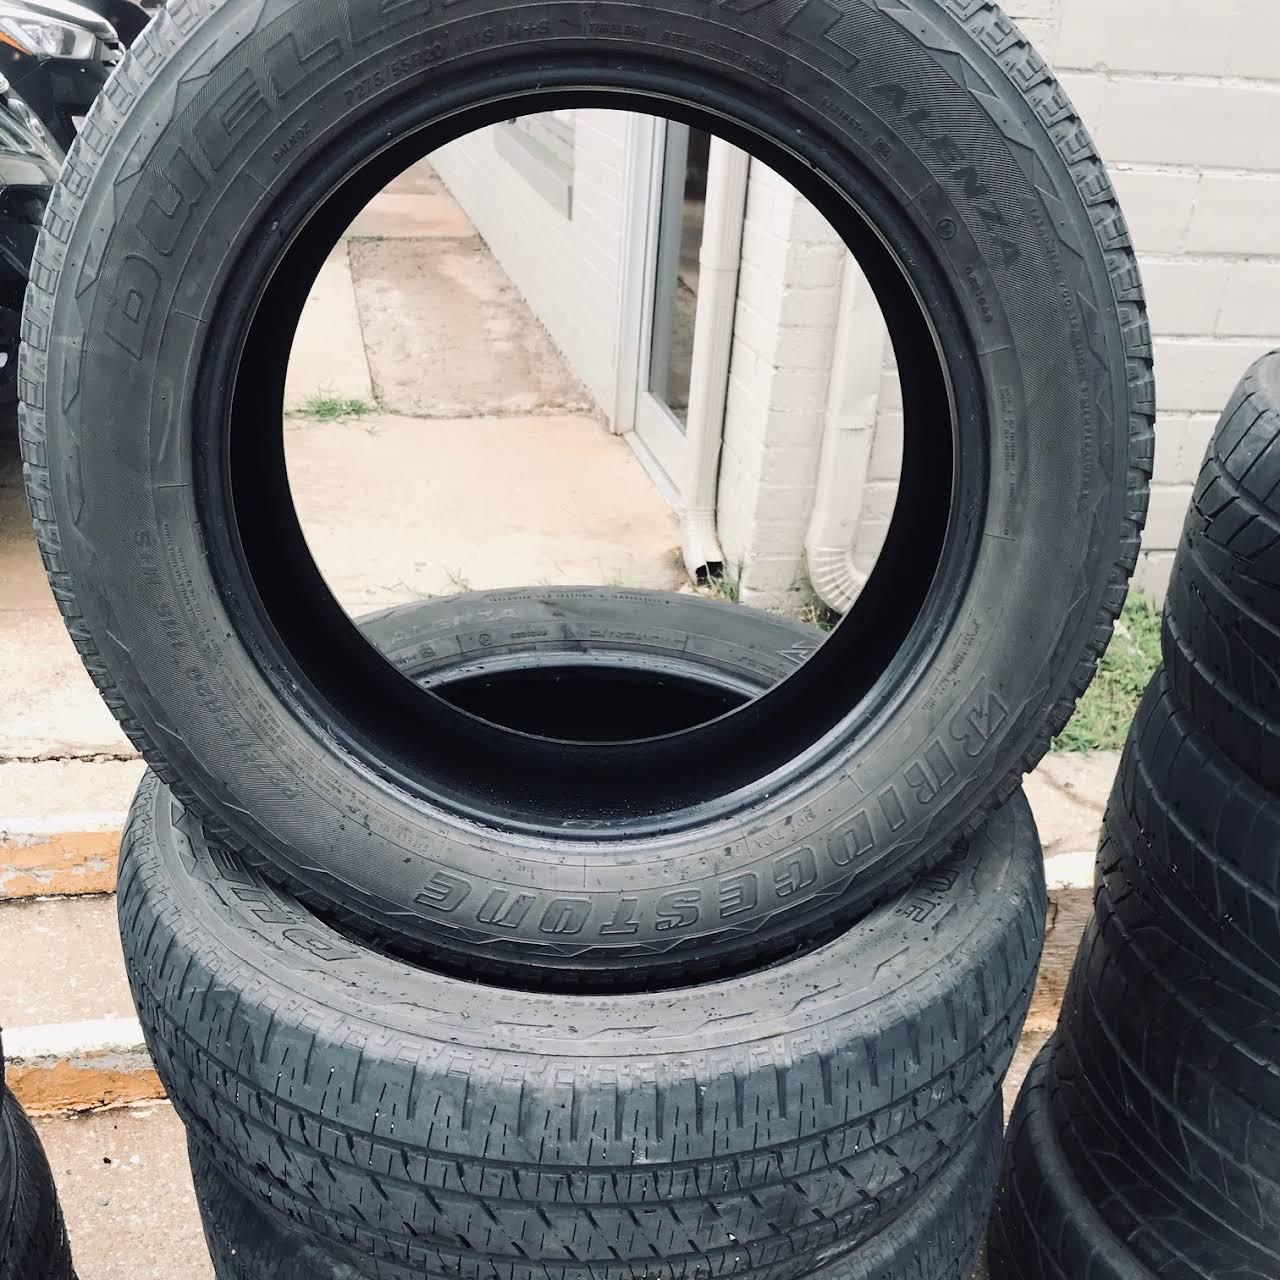 E C Tires Wheels Tire Shop In Norman